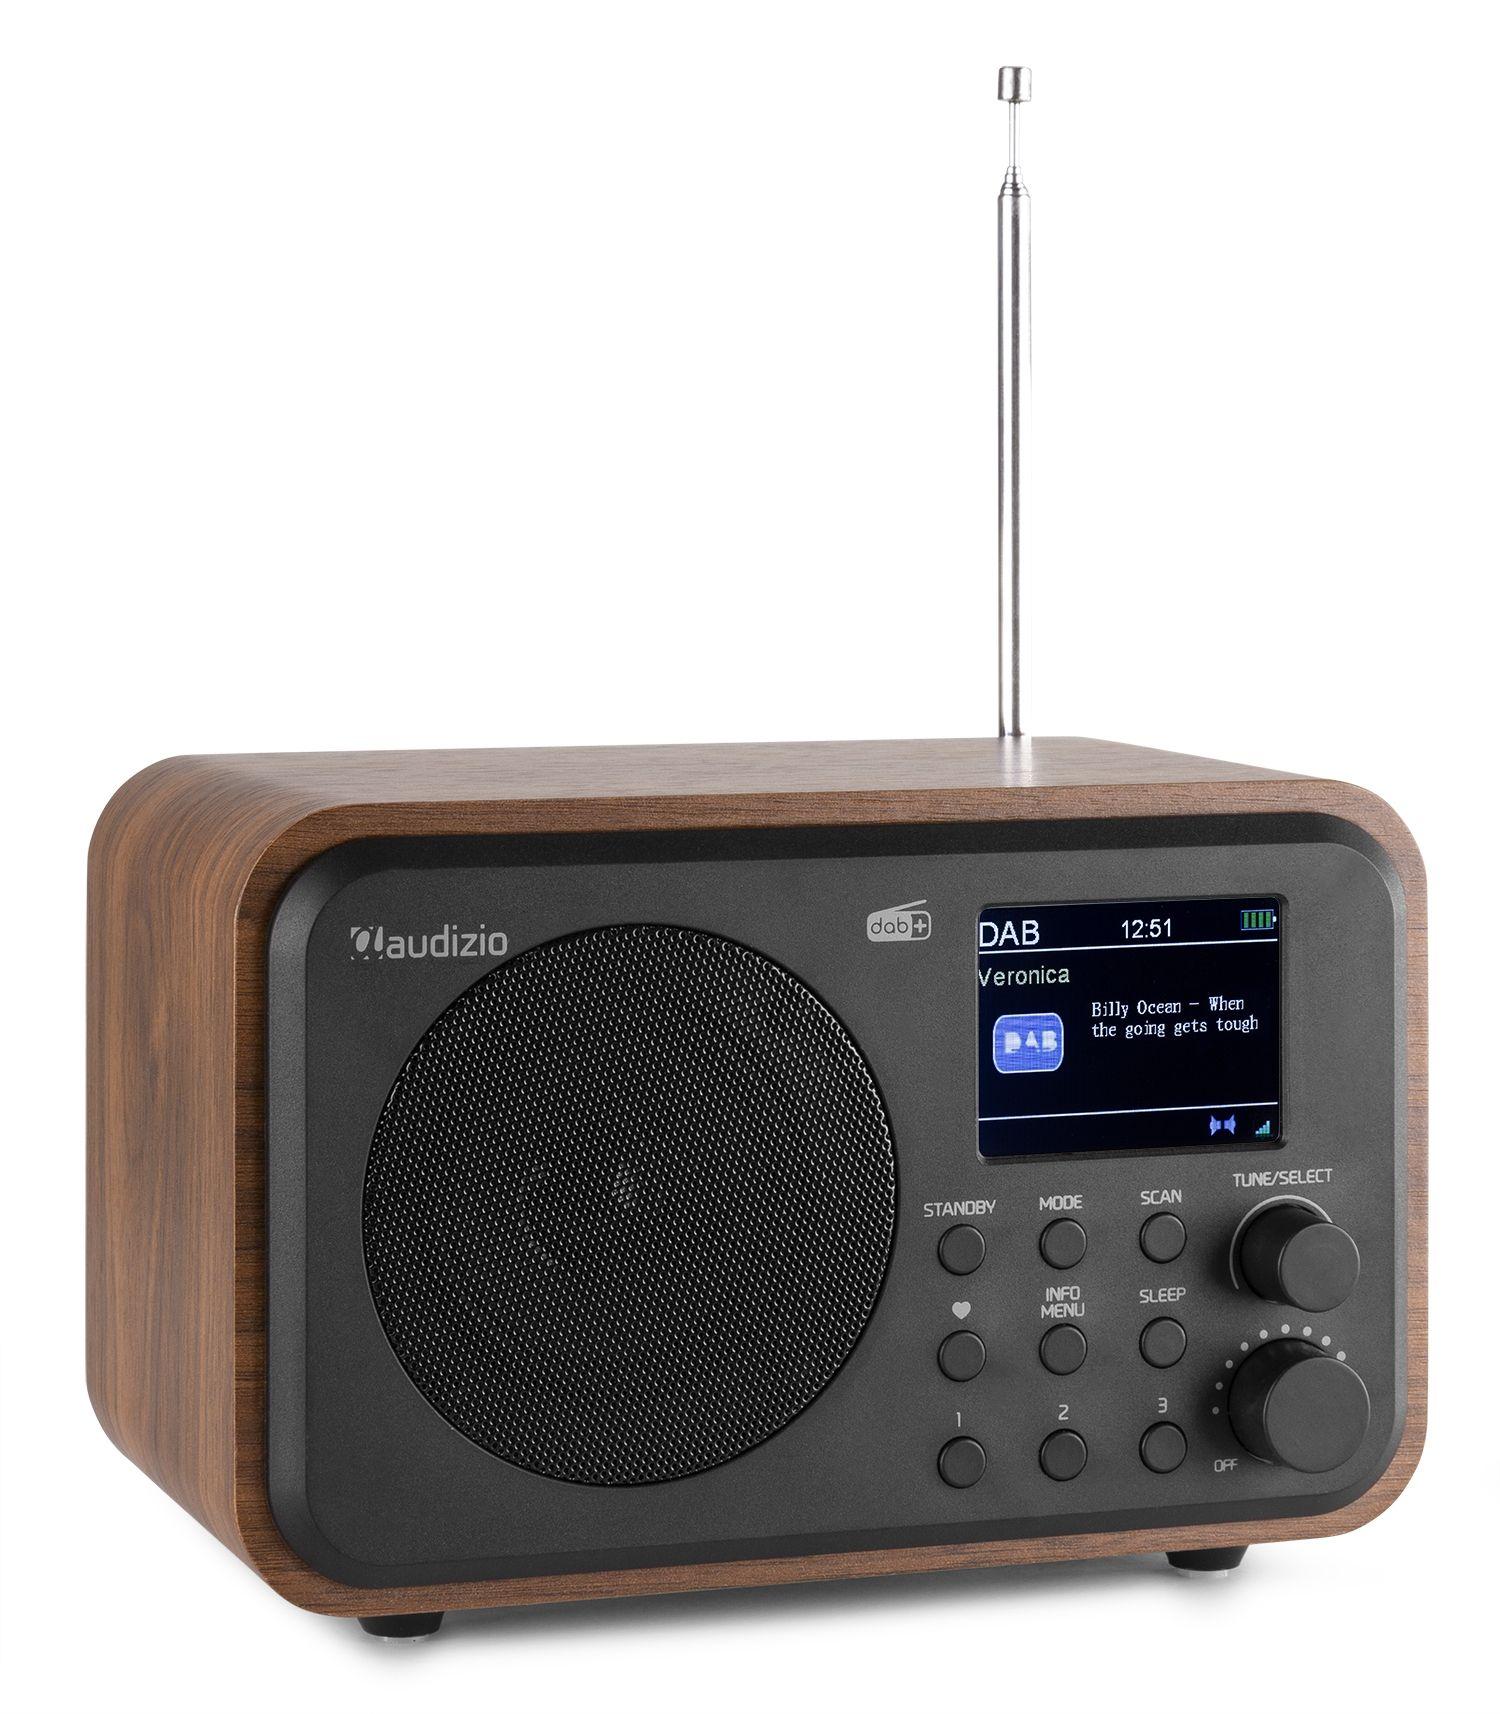 2e keus - Audizio Milan draagbare DAB radio met Bluetooth, FM radio en